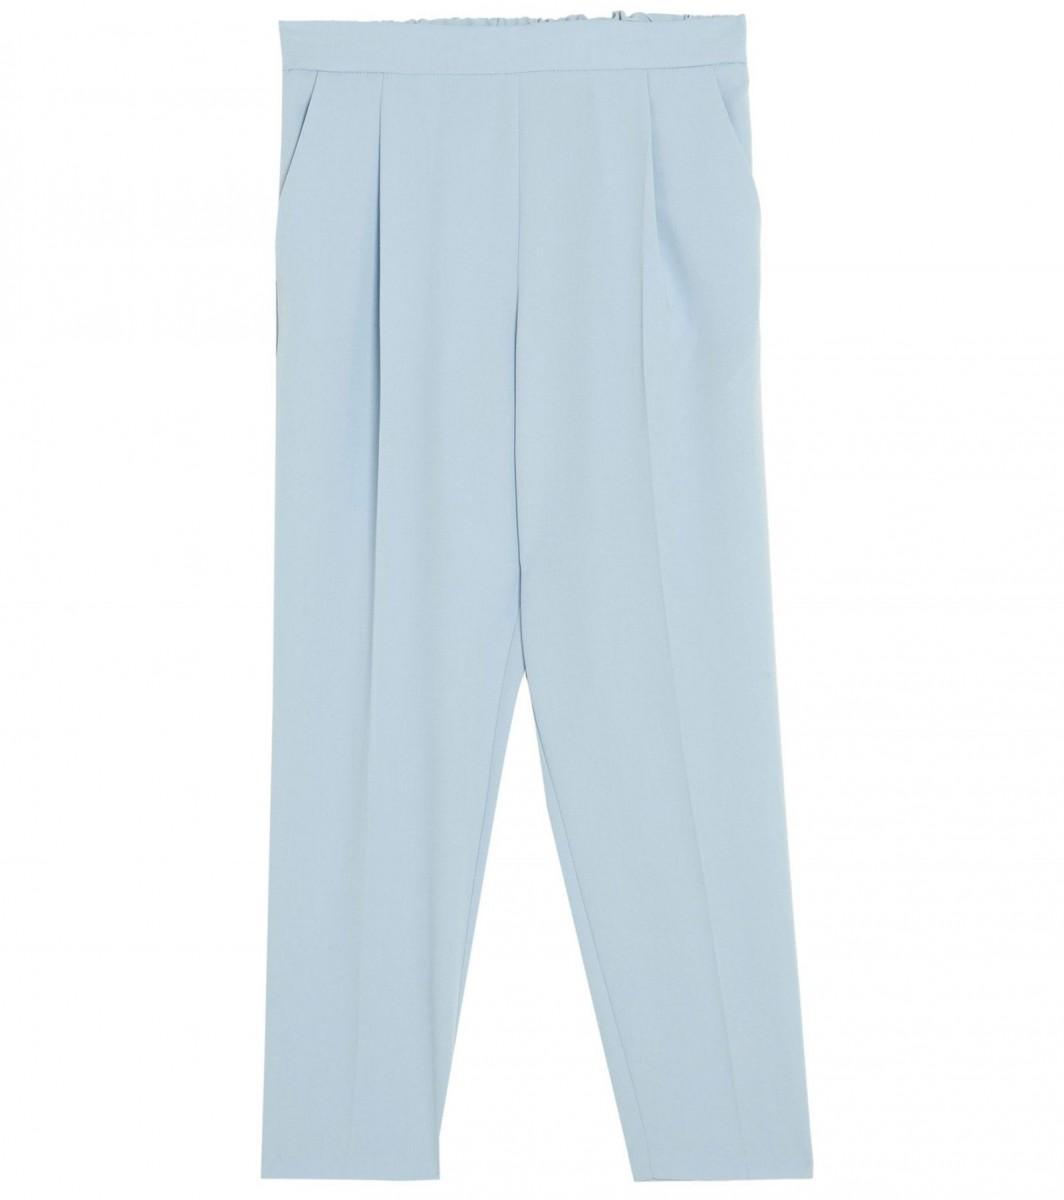 Pantalón jogging básico en color azul pastel de Pull&Bear, por 17,99 euros.